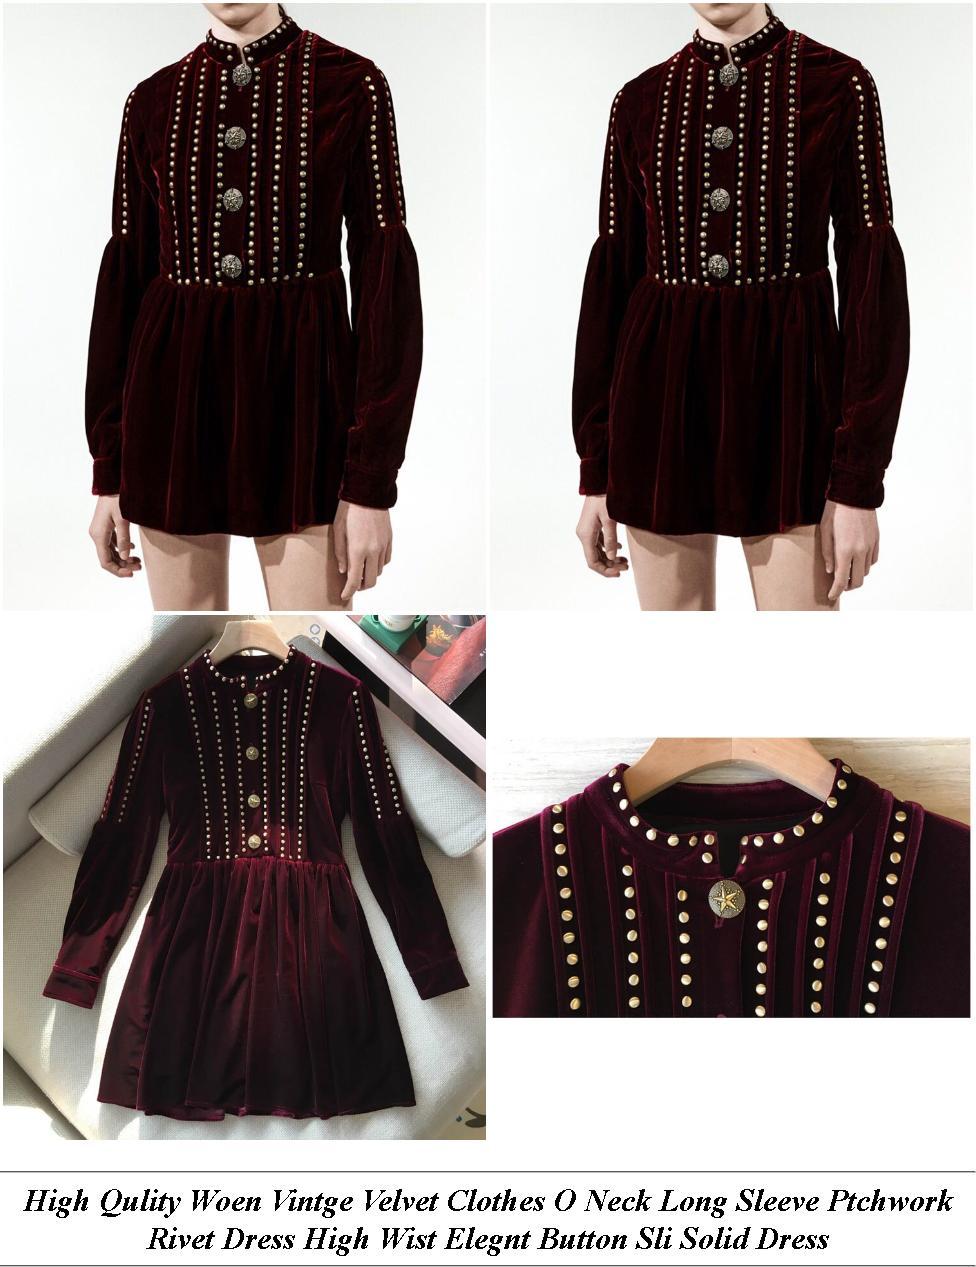 Homecoming Dresses - Sale Sale - Gold Dress - Cheap Designer Clothes